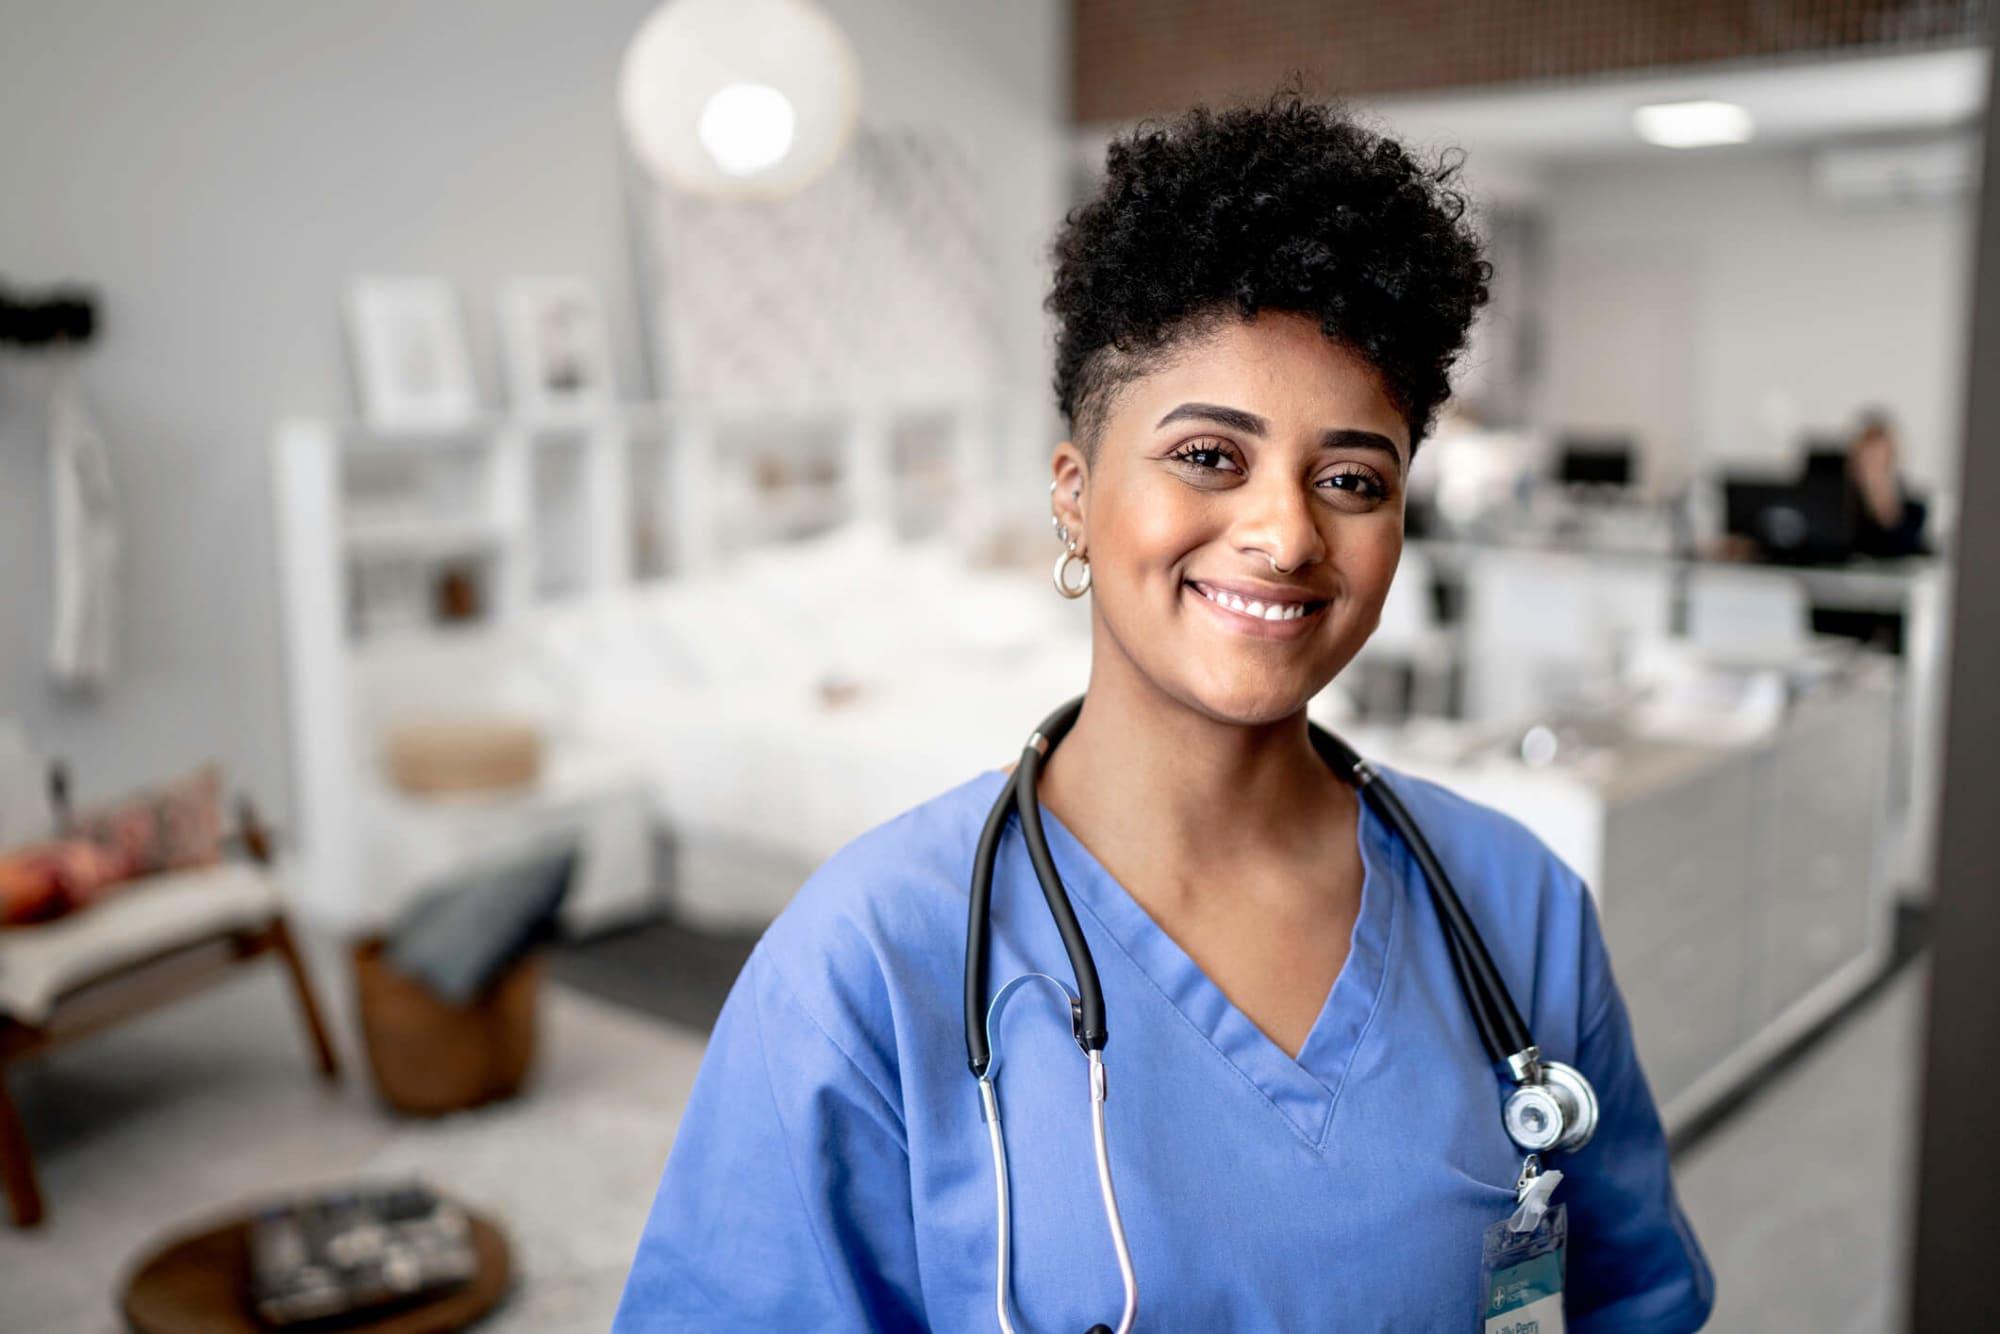 Ask a Nurse: Can I Expect Job Offers Post-Graduation?